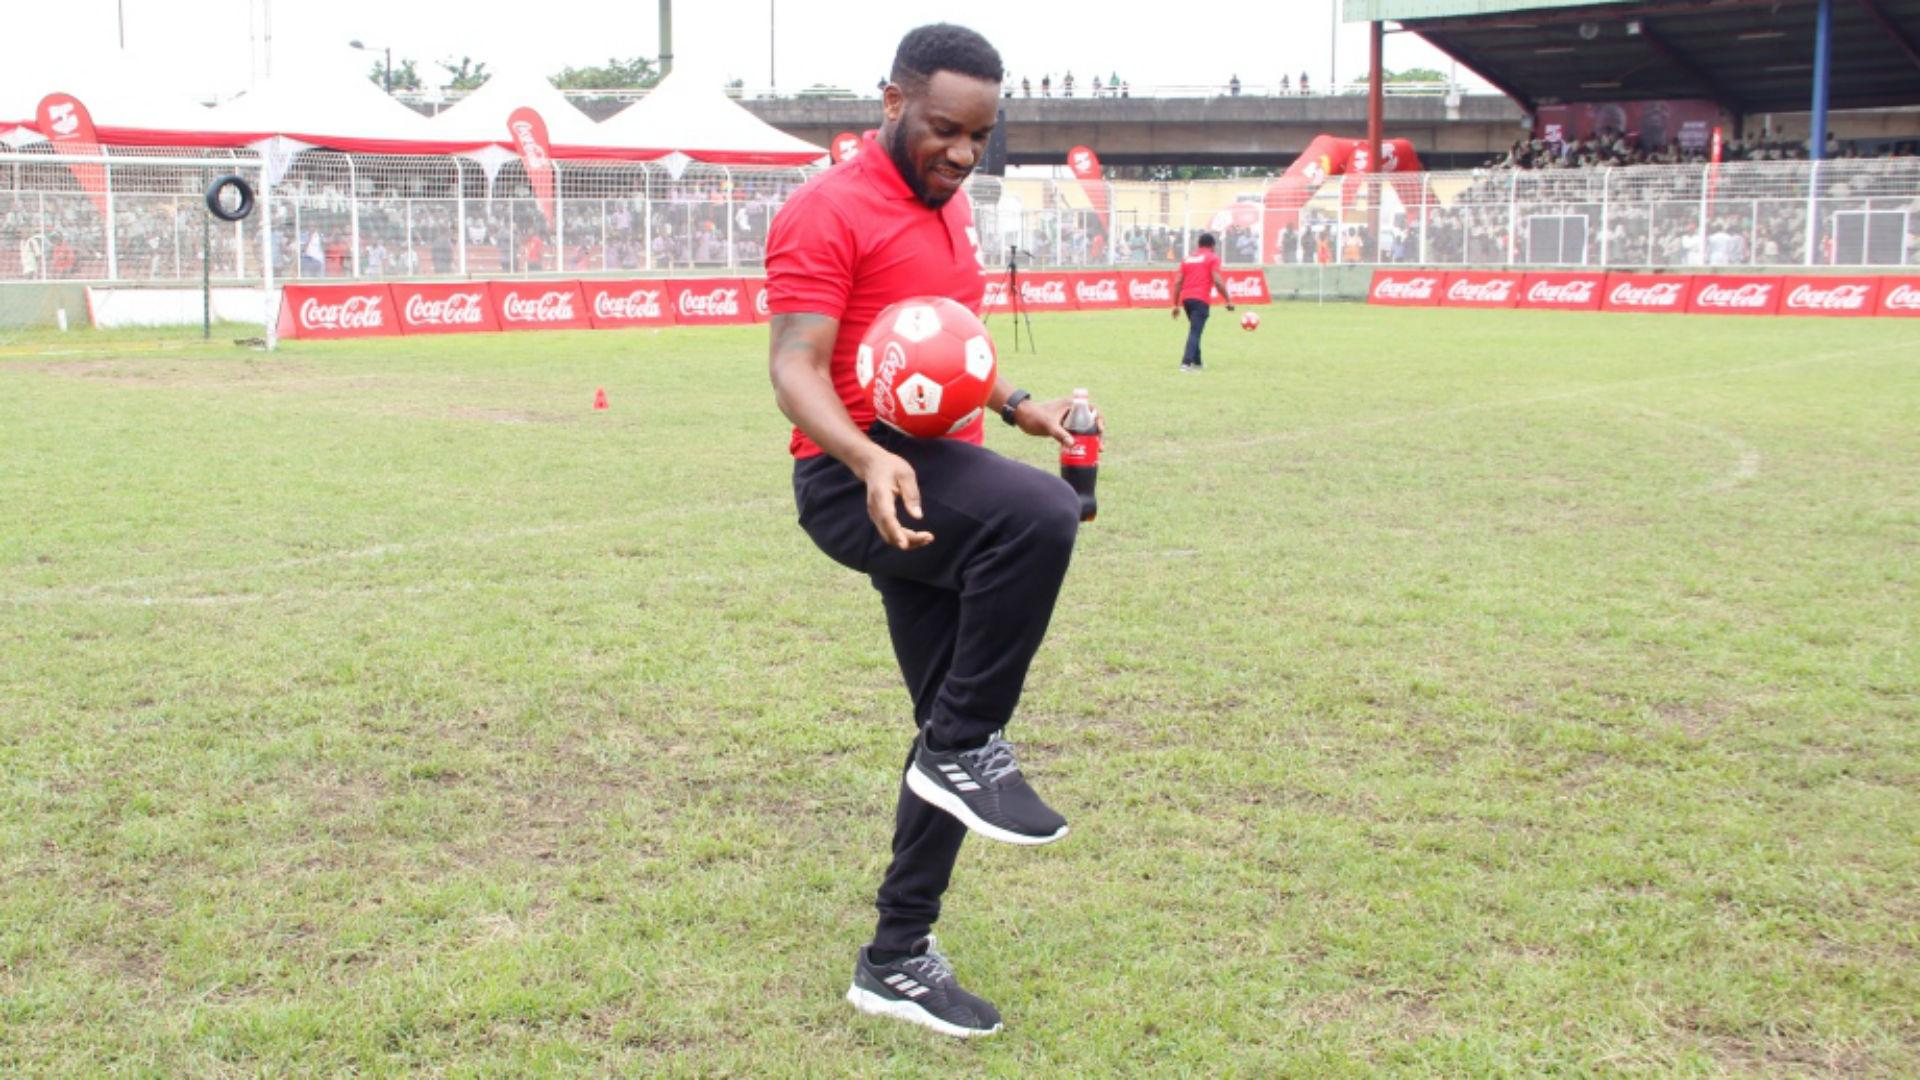 Jay Jay Okocha showing skills during Dare The COPA legends Stunt